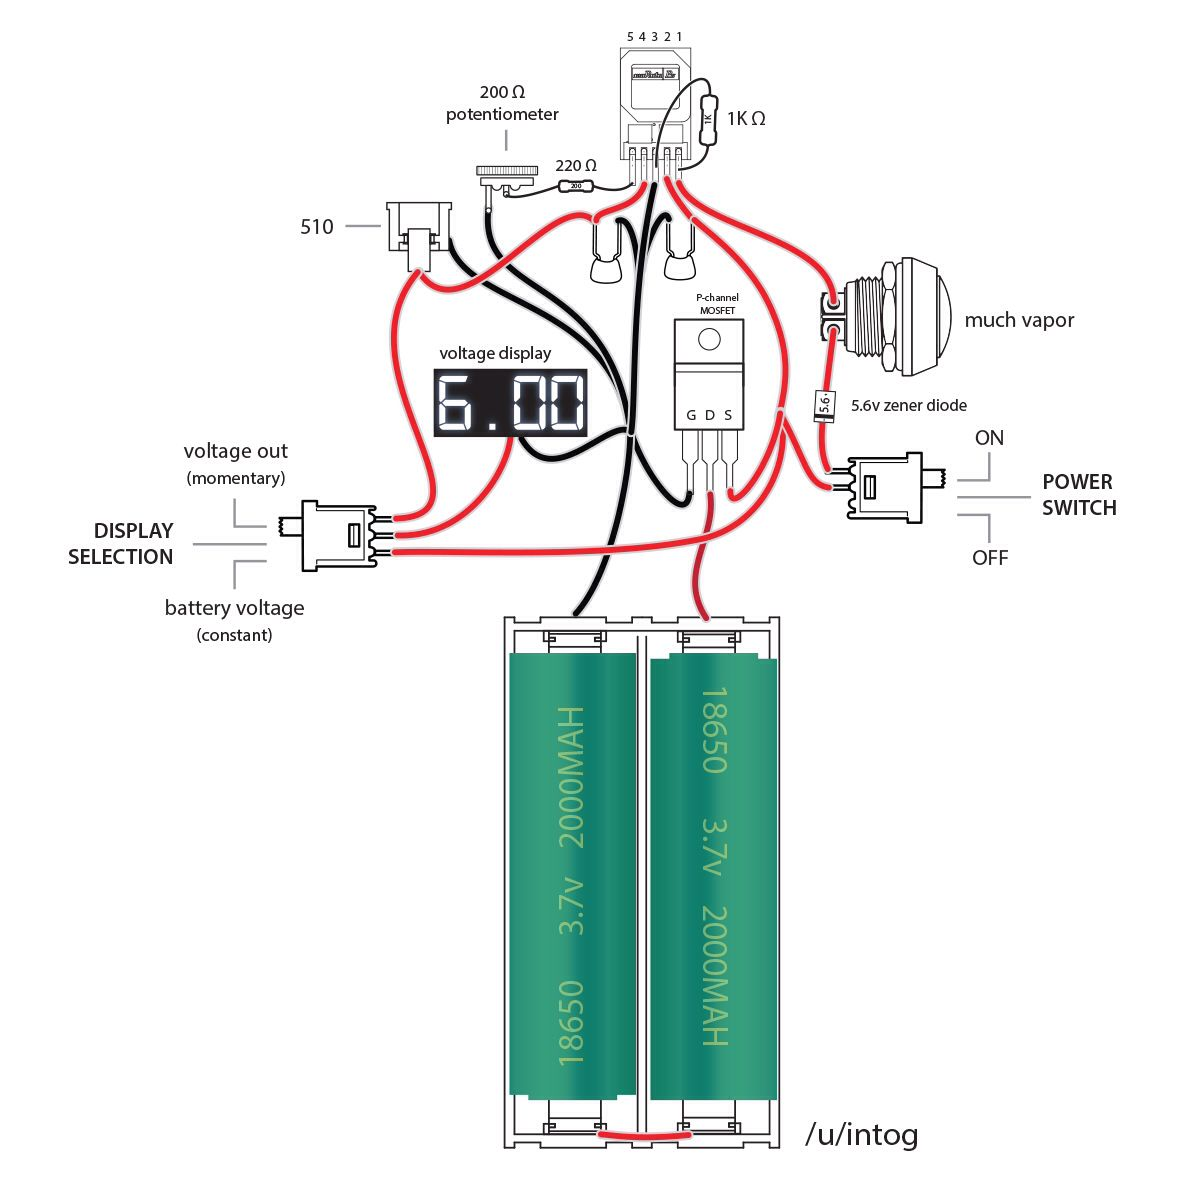 diy wiring diagrams john deere l120 pto switch diagram box mod connector